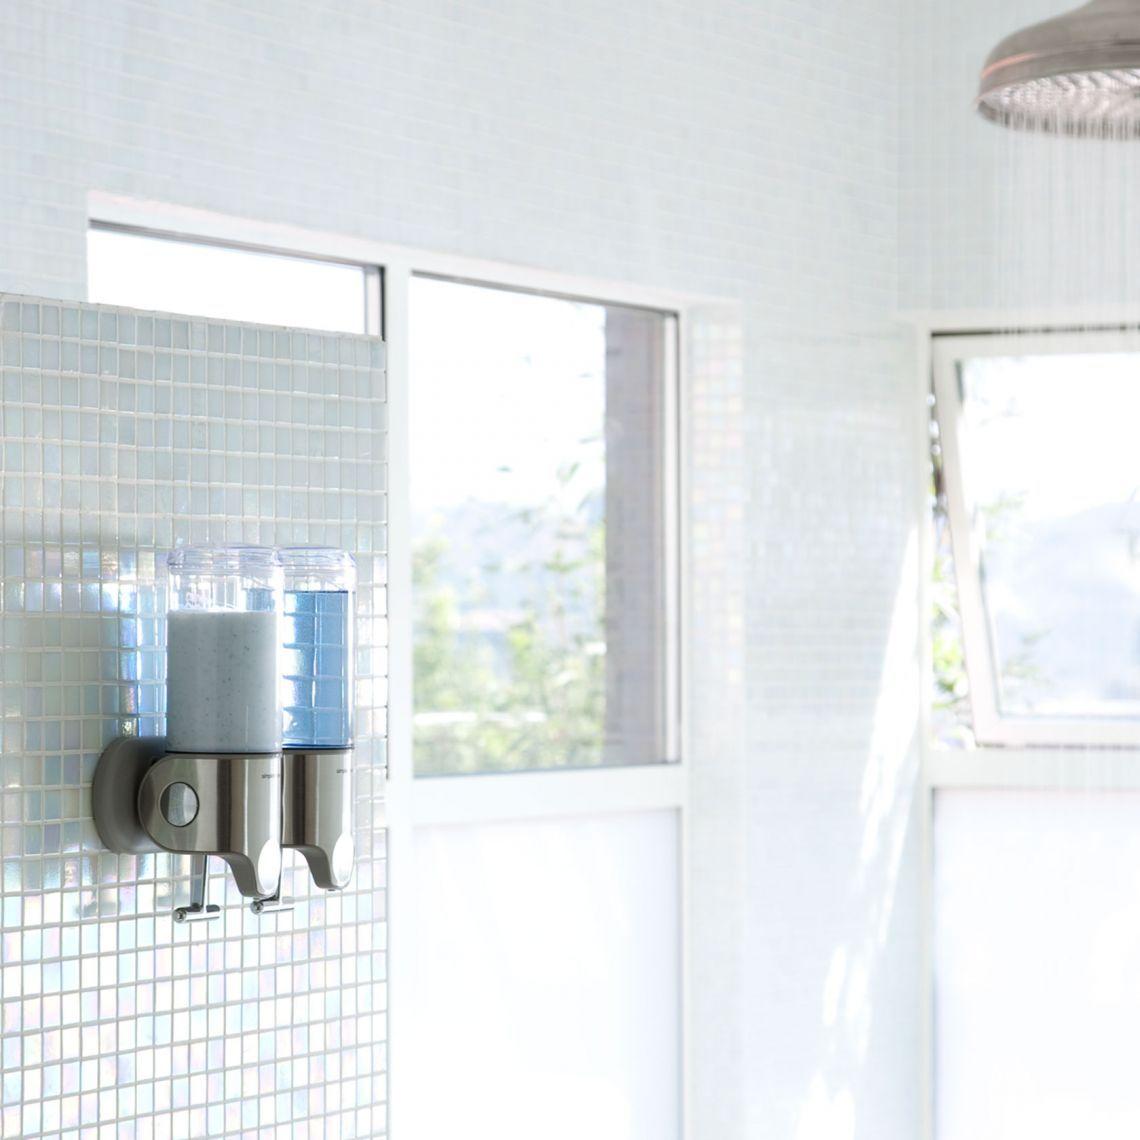 Wall Mount Pump Stainless Steel Simplehuman Sleek Bathroom